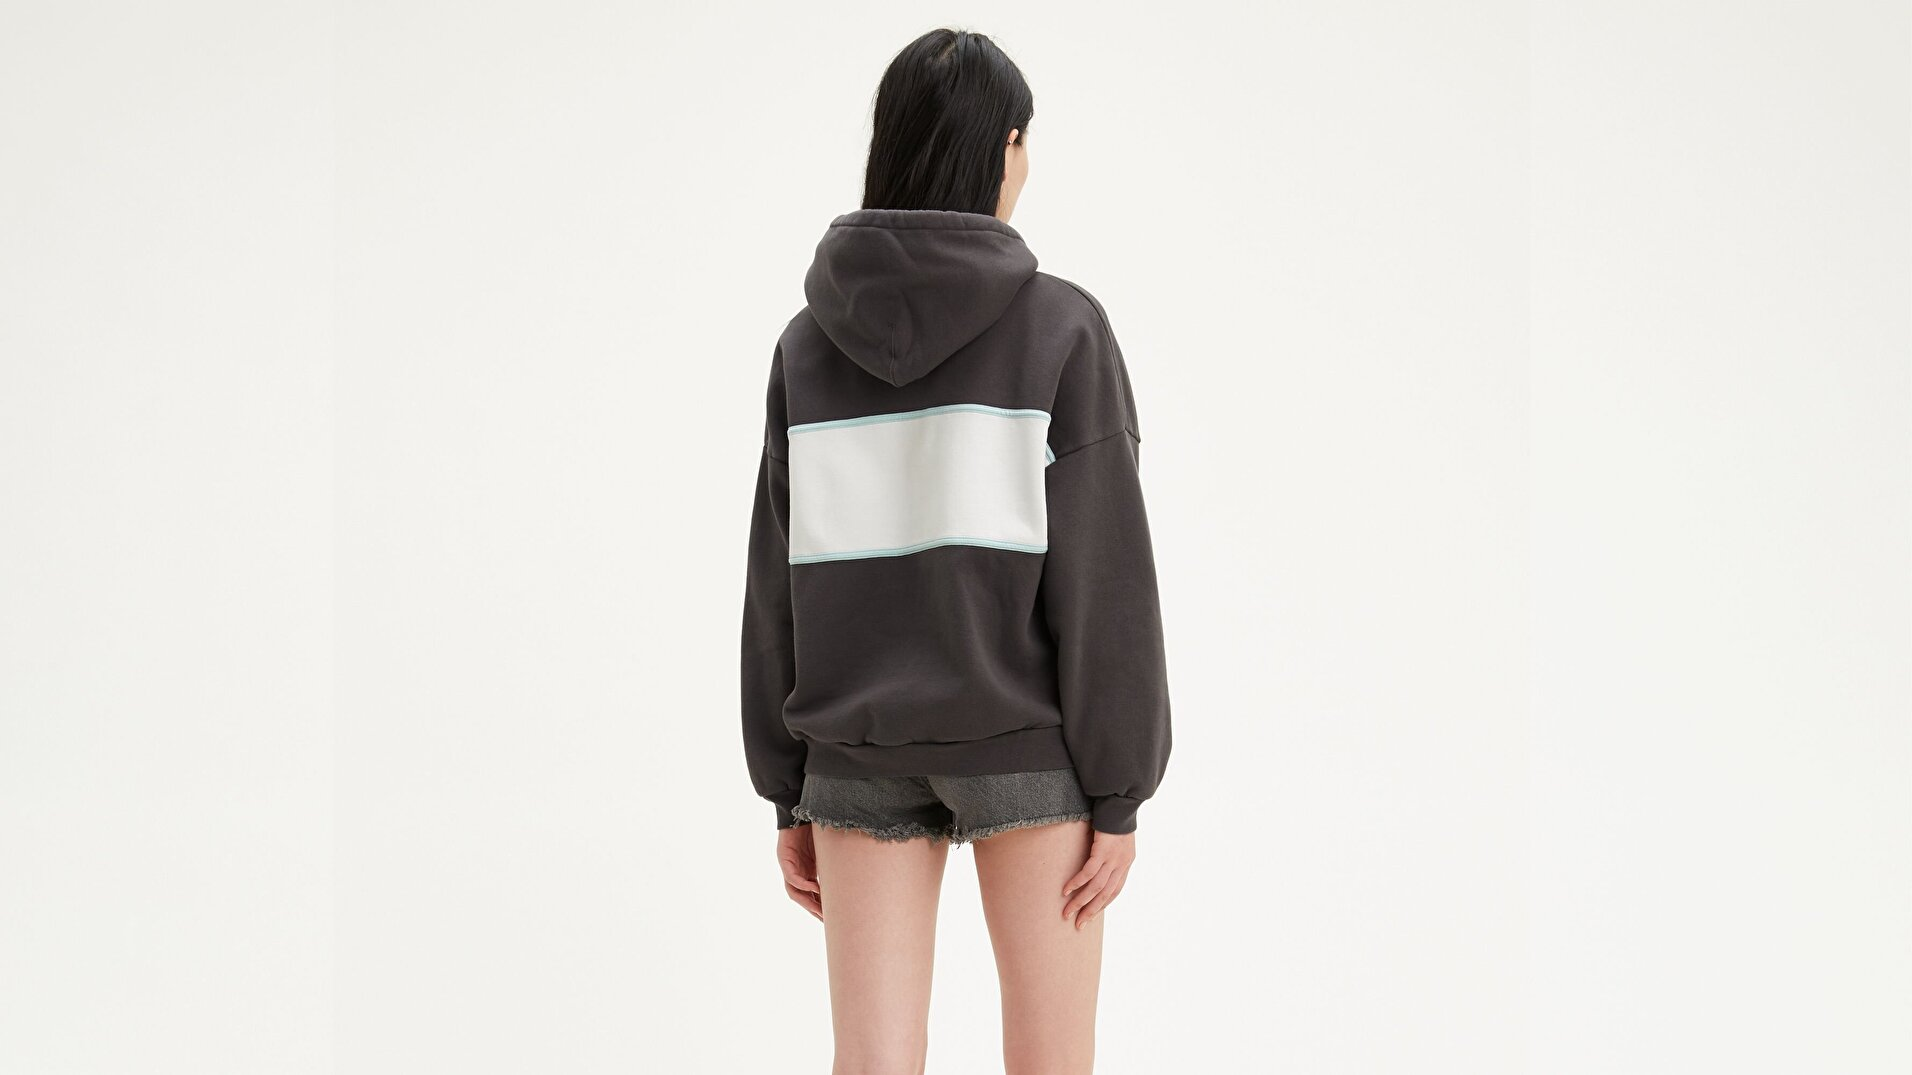 Cameron Hoodie Levi Chest Çok renkli Kadın Kapüşonlu Sweatshirt